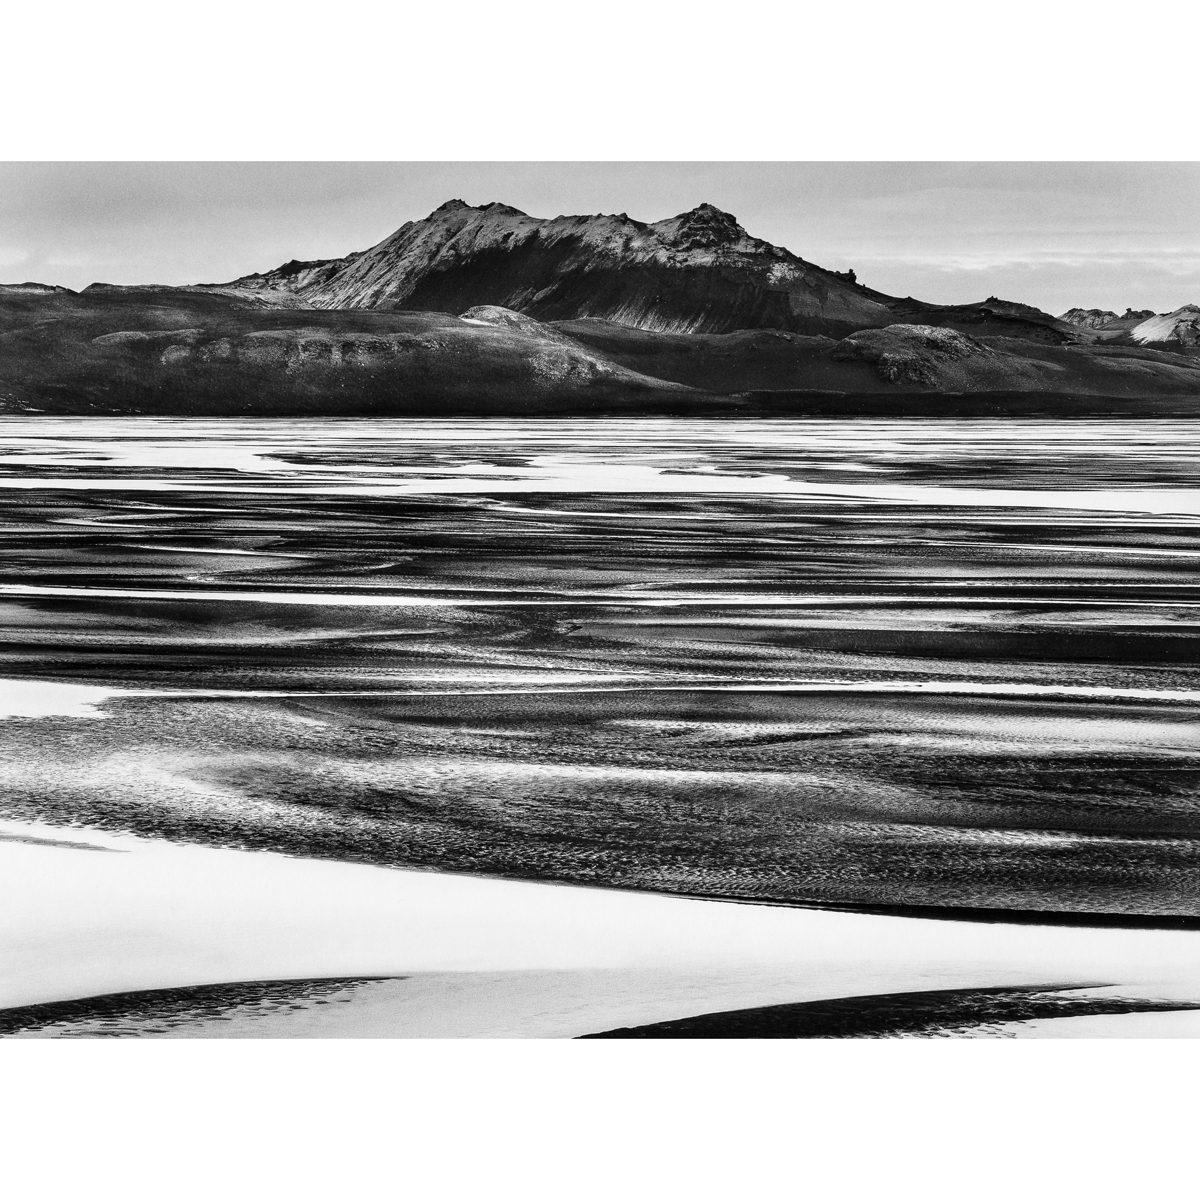 2016-Linhof-Technikardan-4x5-Iceland-MGFBWT1K.jpg by Max Bedov